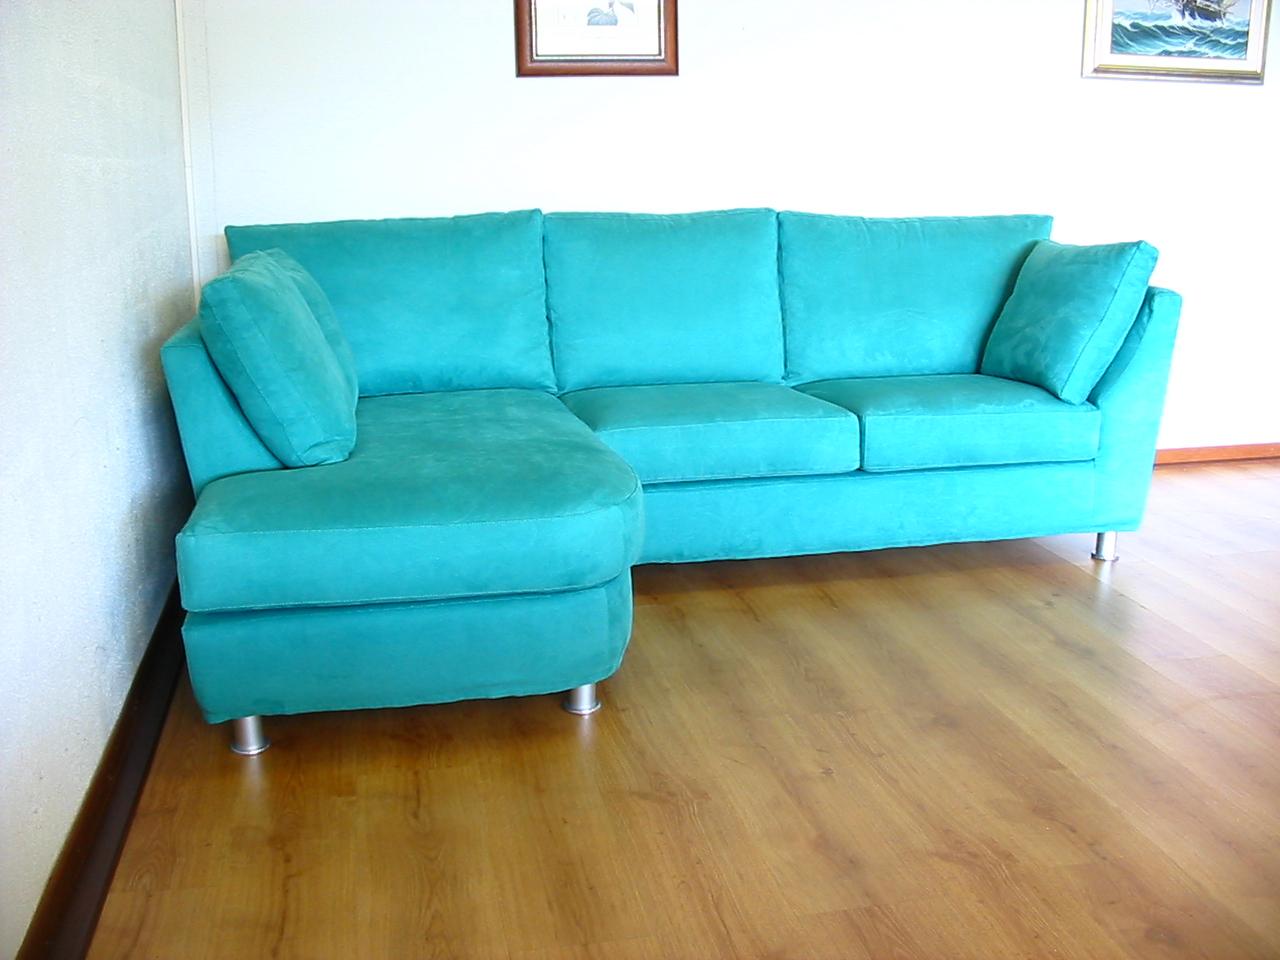 Ottimizzare gli spazi con i divani moderni a profondit ridotta - Profondita divano ...